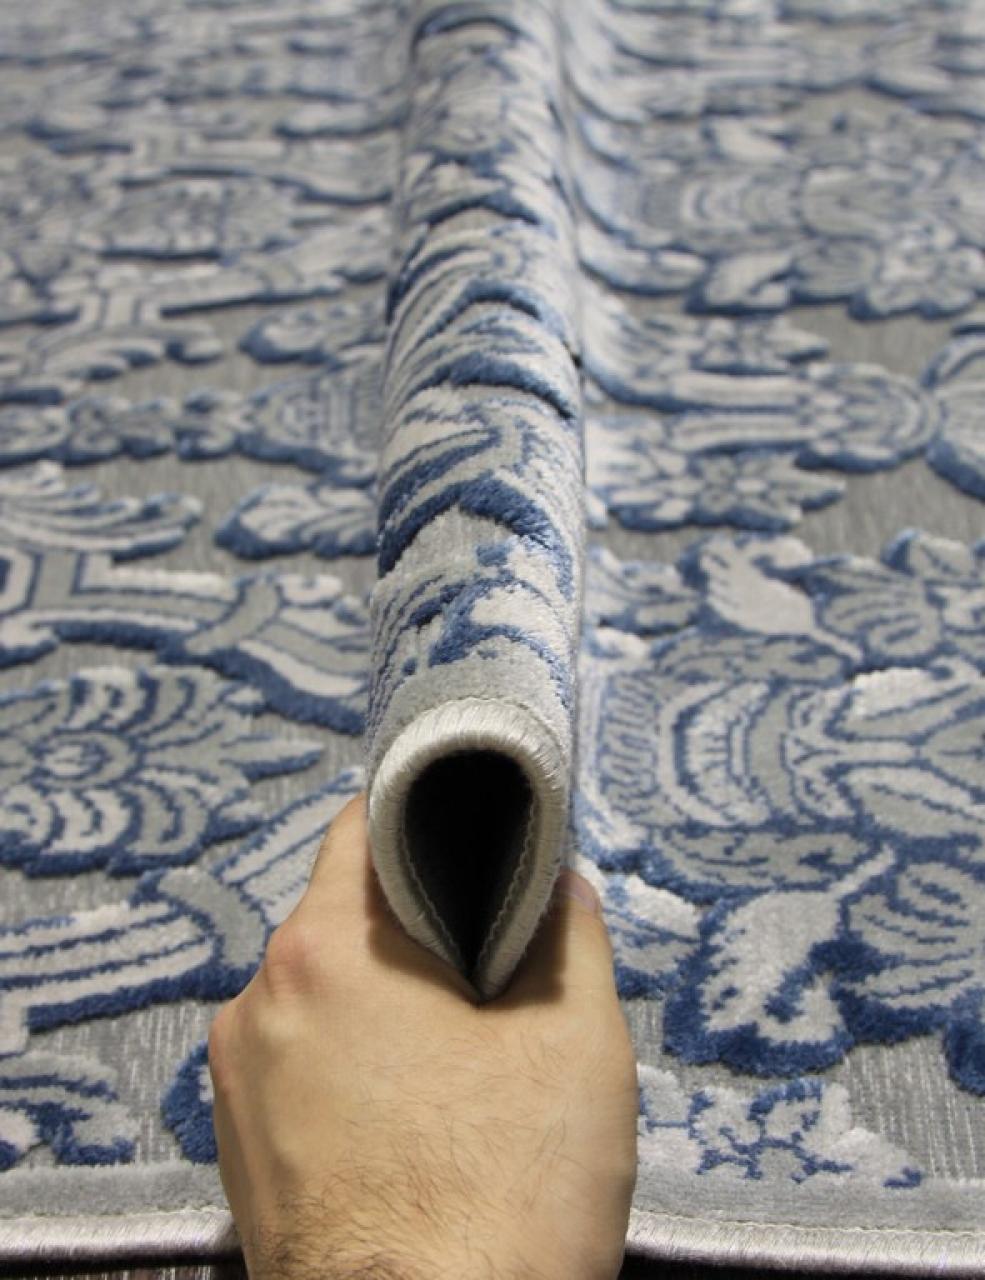 Ковер 0VC996 - SKY BLUE - Прямоугольник - коллекция TIFFANY - фото 2